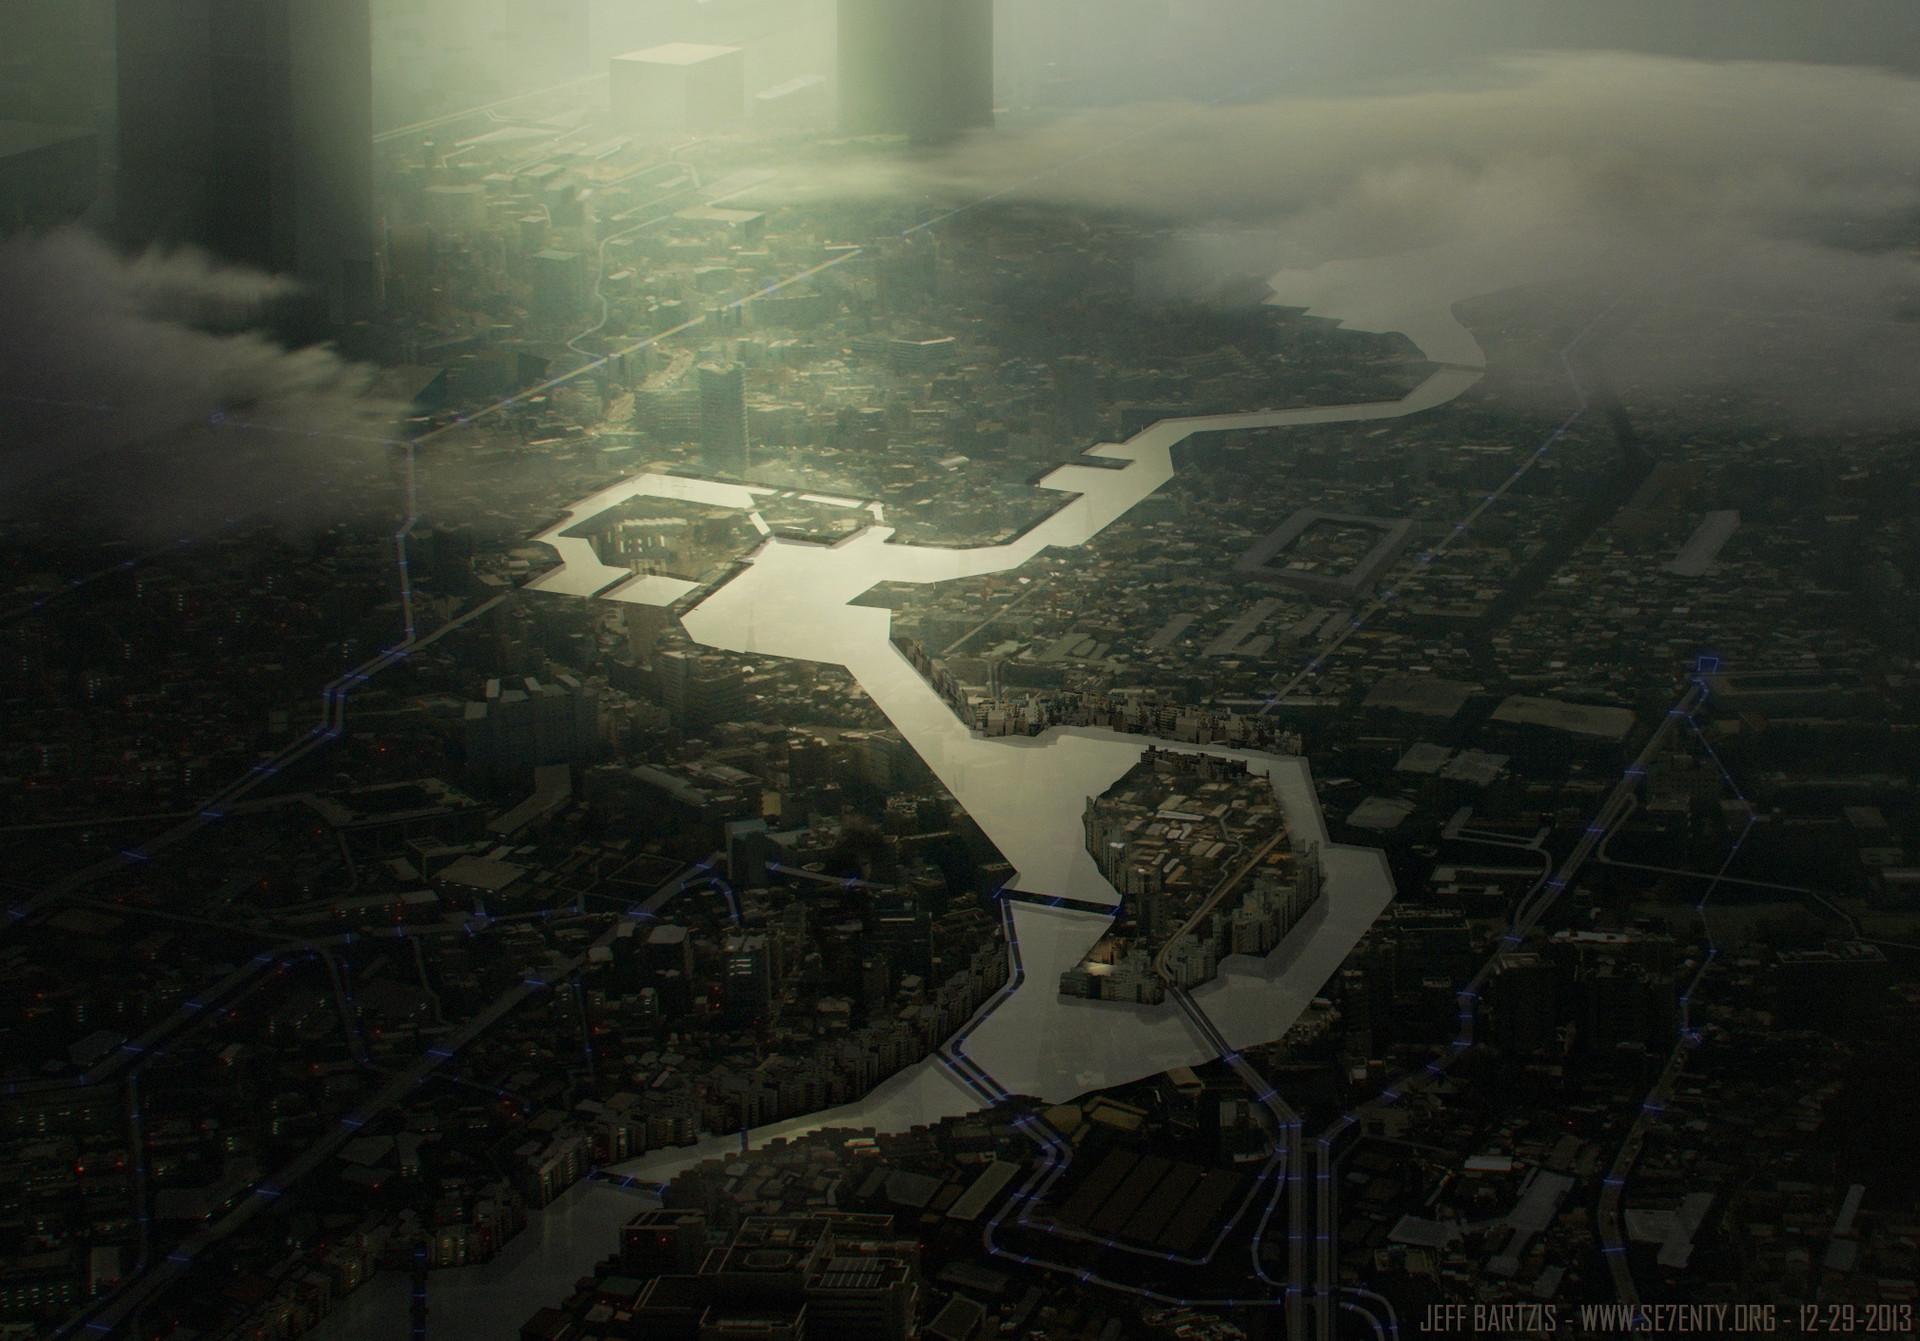 Jeff bartzis cityscape 02